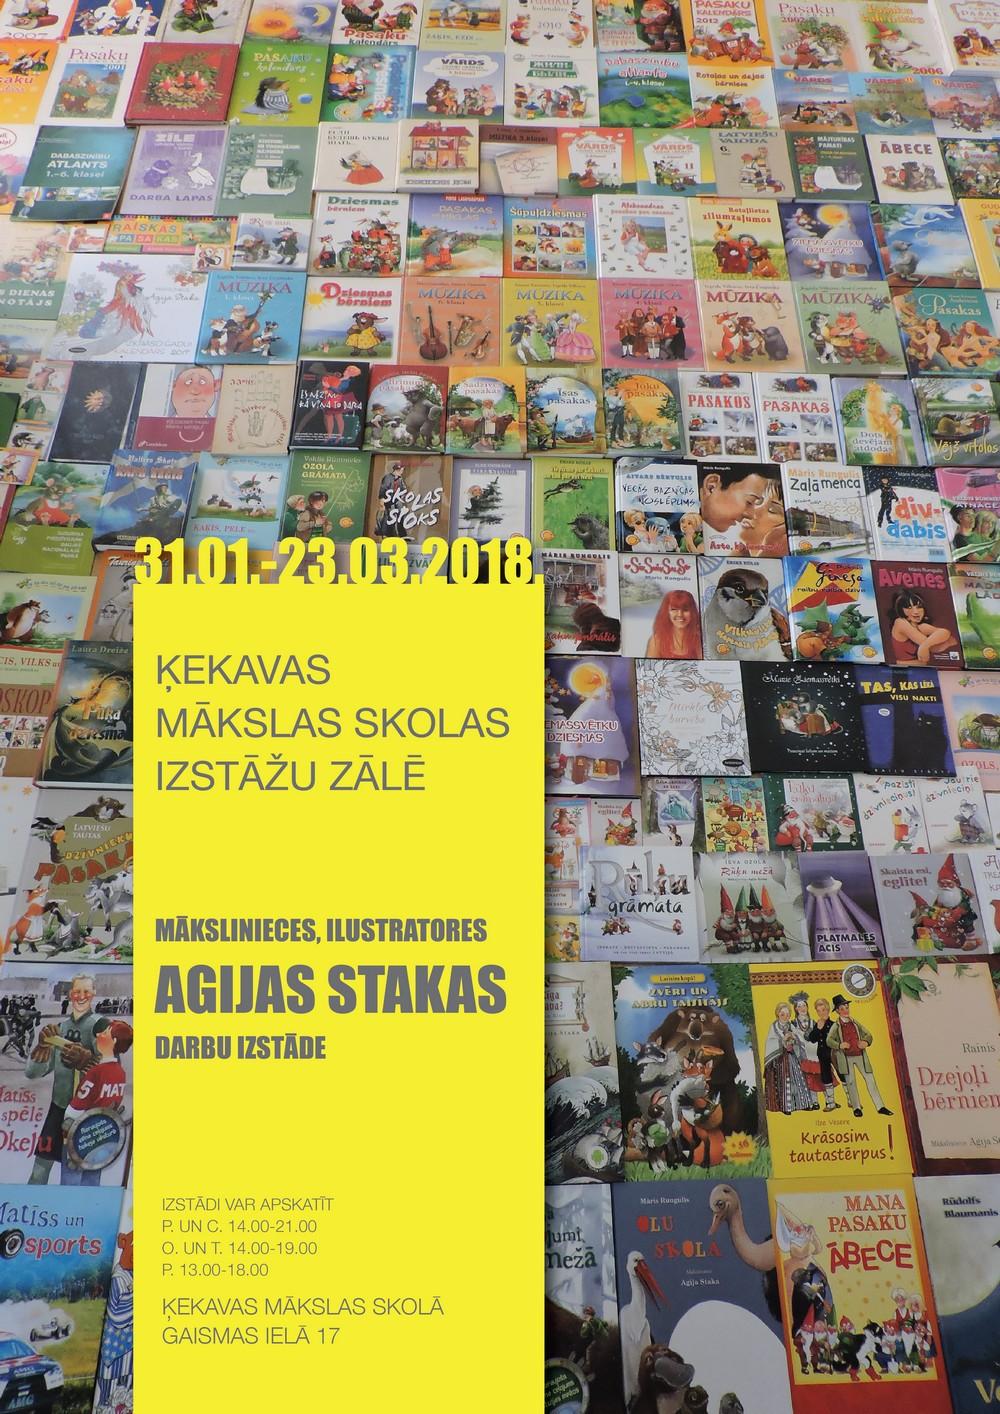 Izstades_2018_Agija Staka-01